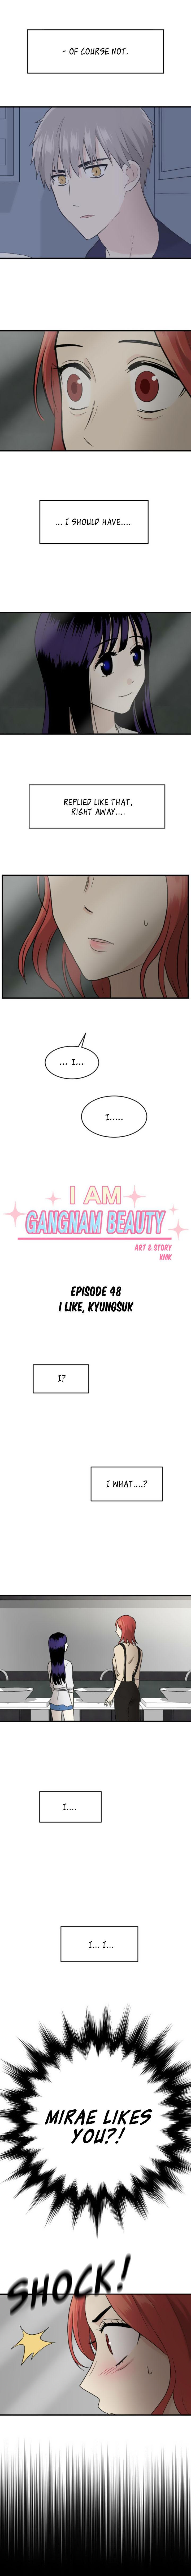 My ID is Gangnam Beauty 48: I Like, Kyungsuk at MangaFox